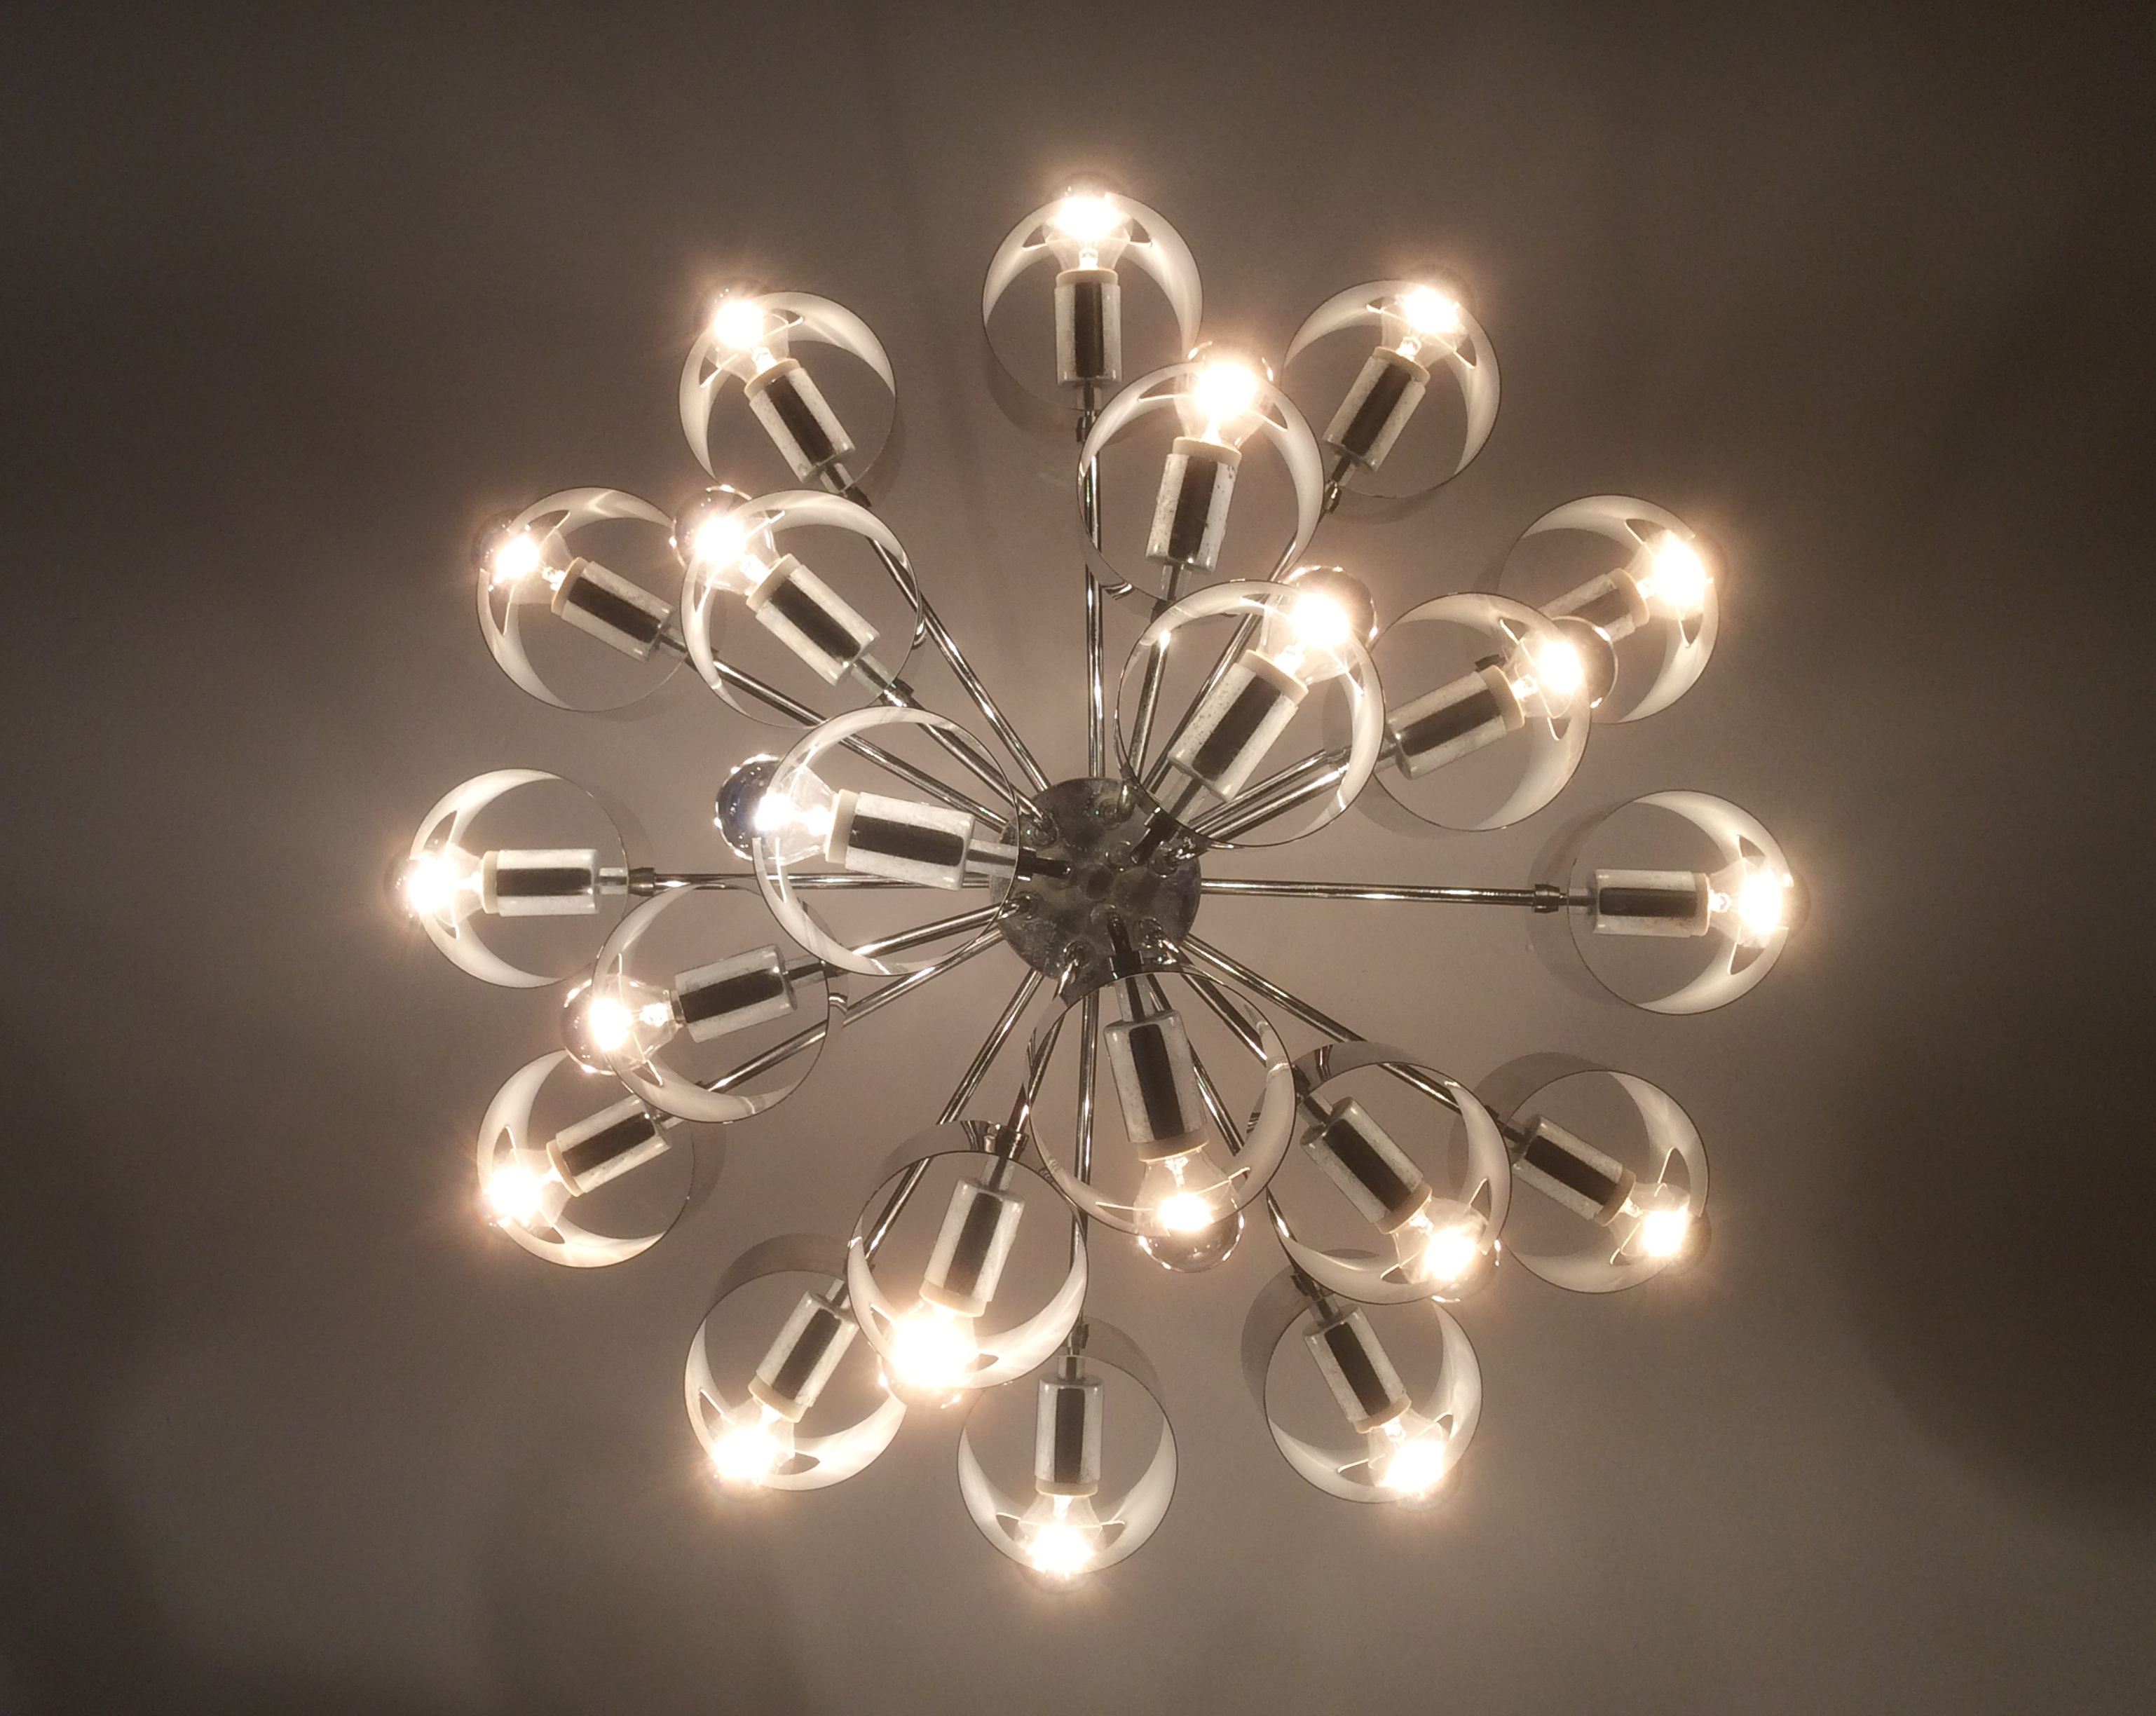 lamperti grand lustre alu 21 feux les illumin s design. Black Bedroom Furniture Sets. Home Design Ideas